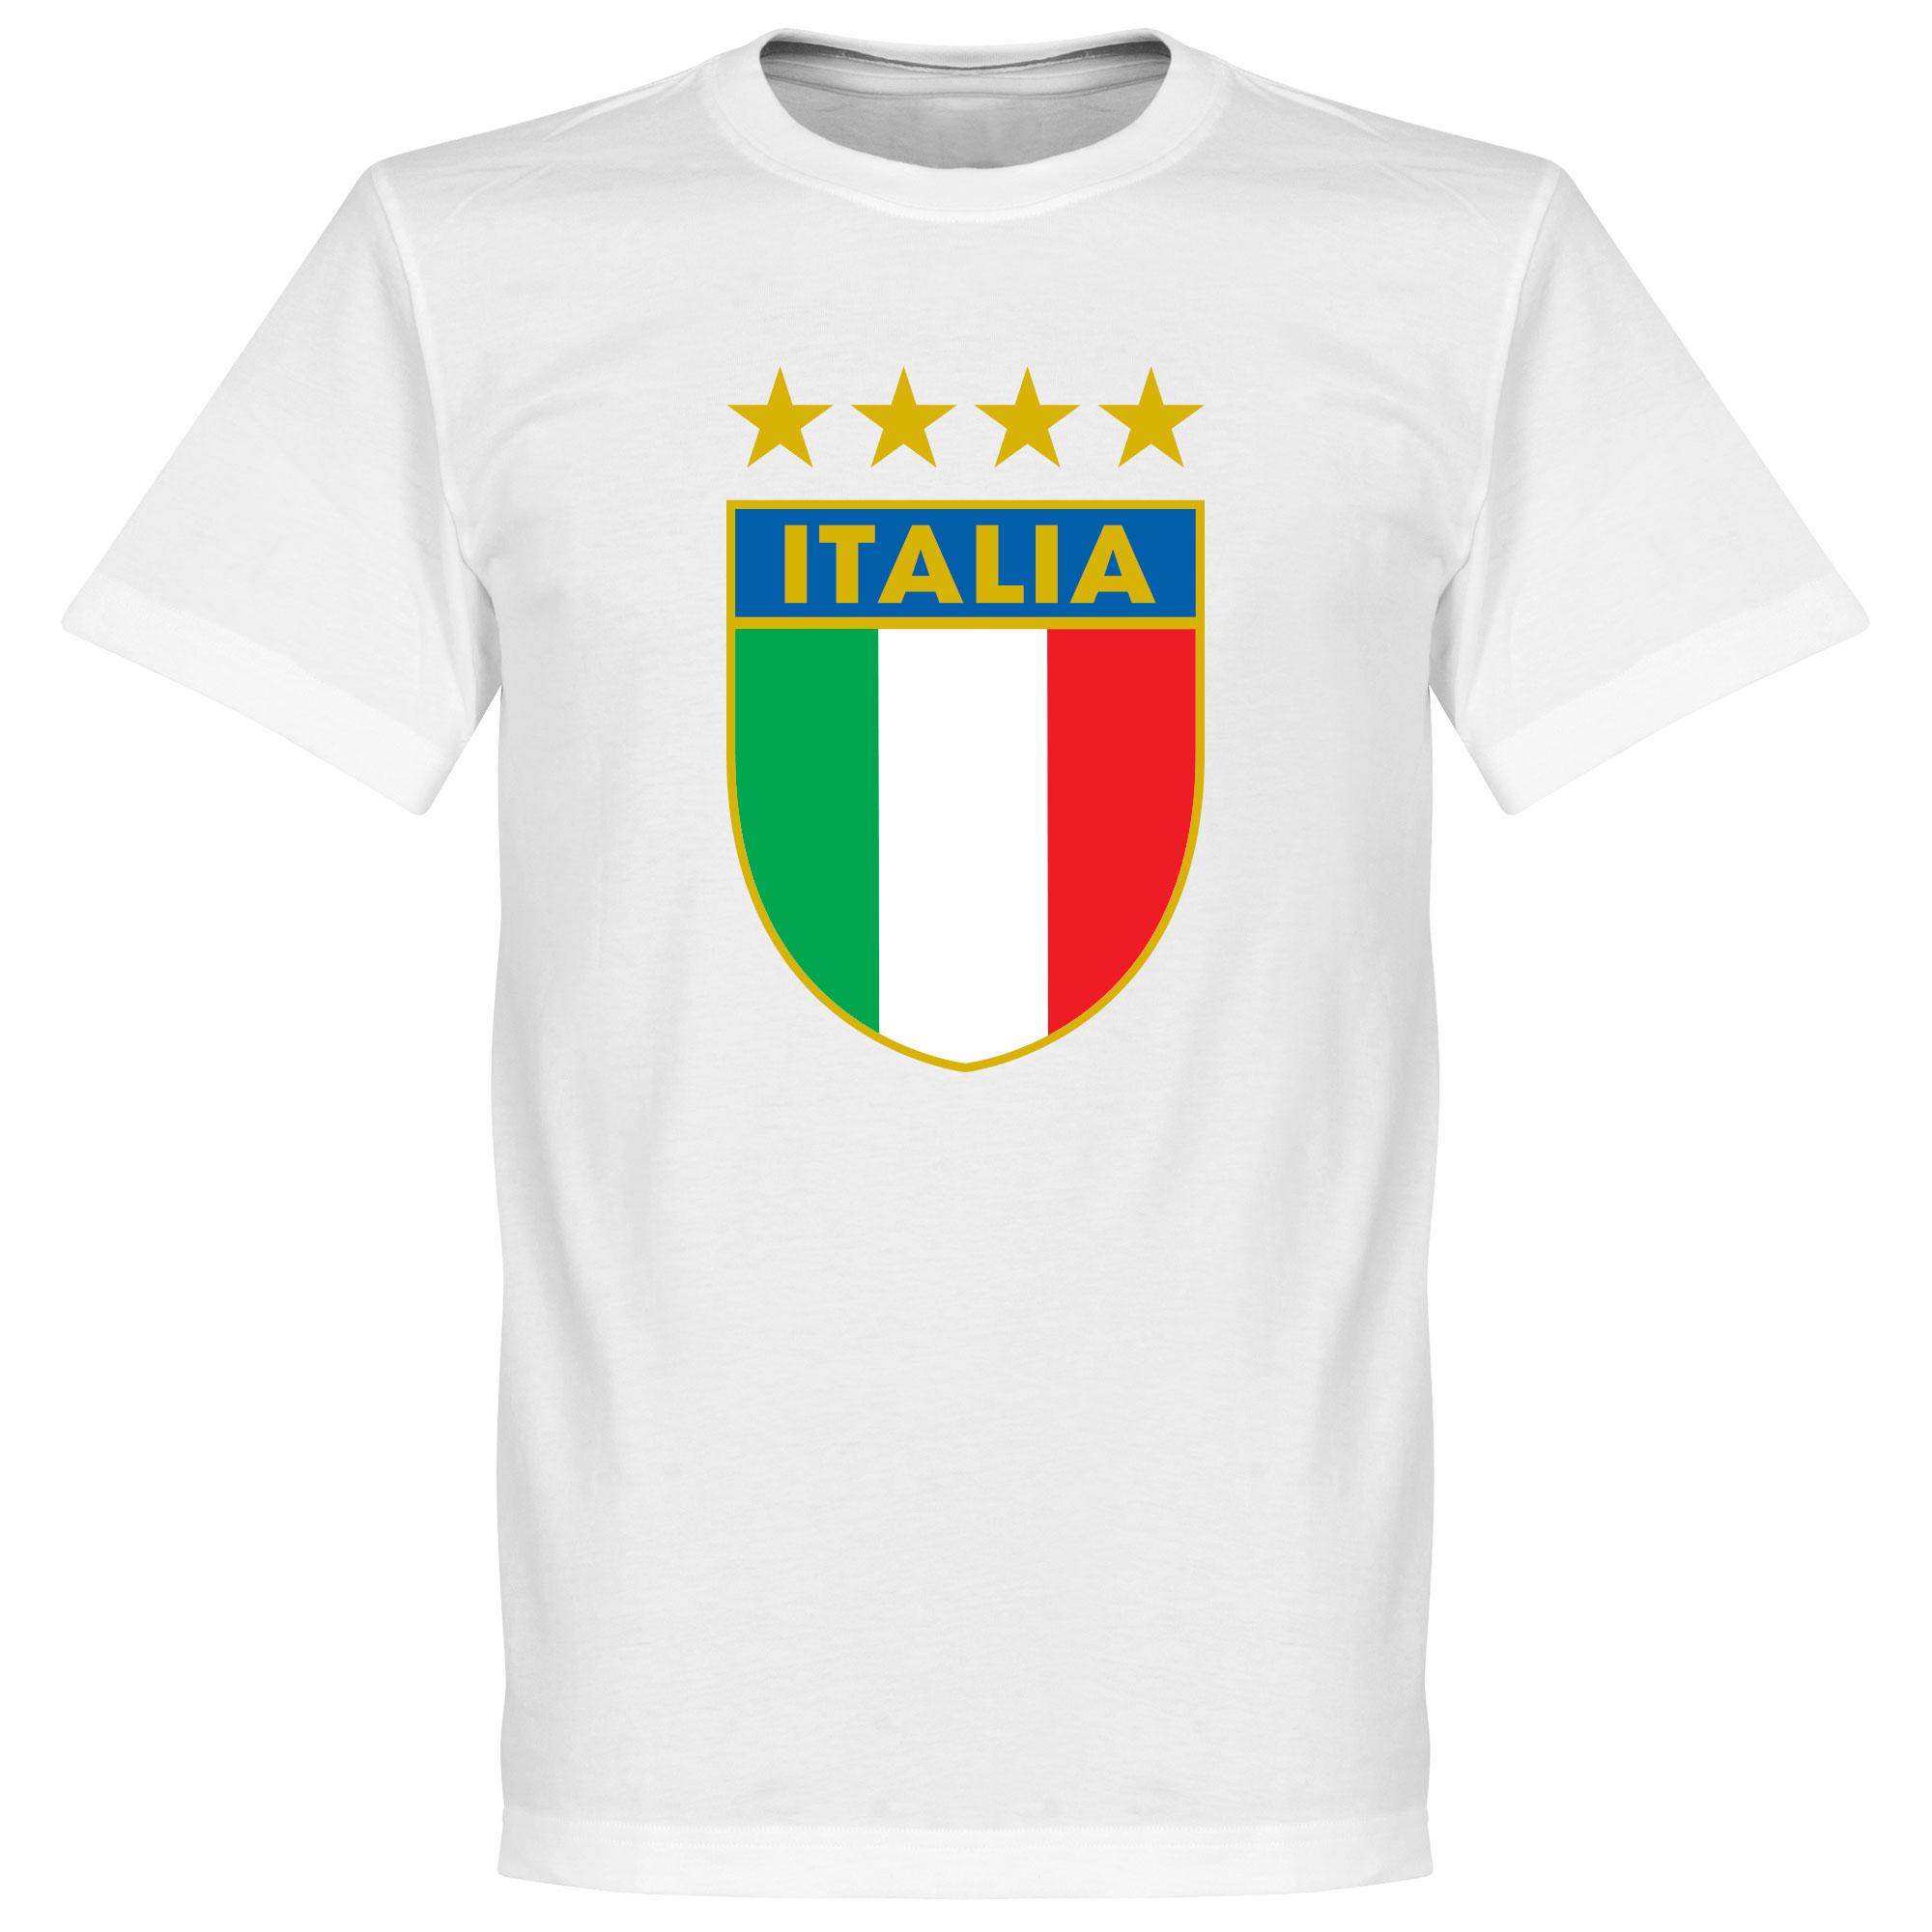 Italia Crest Tee - White - S